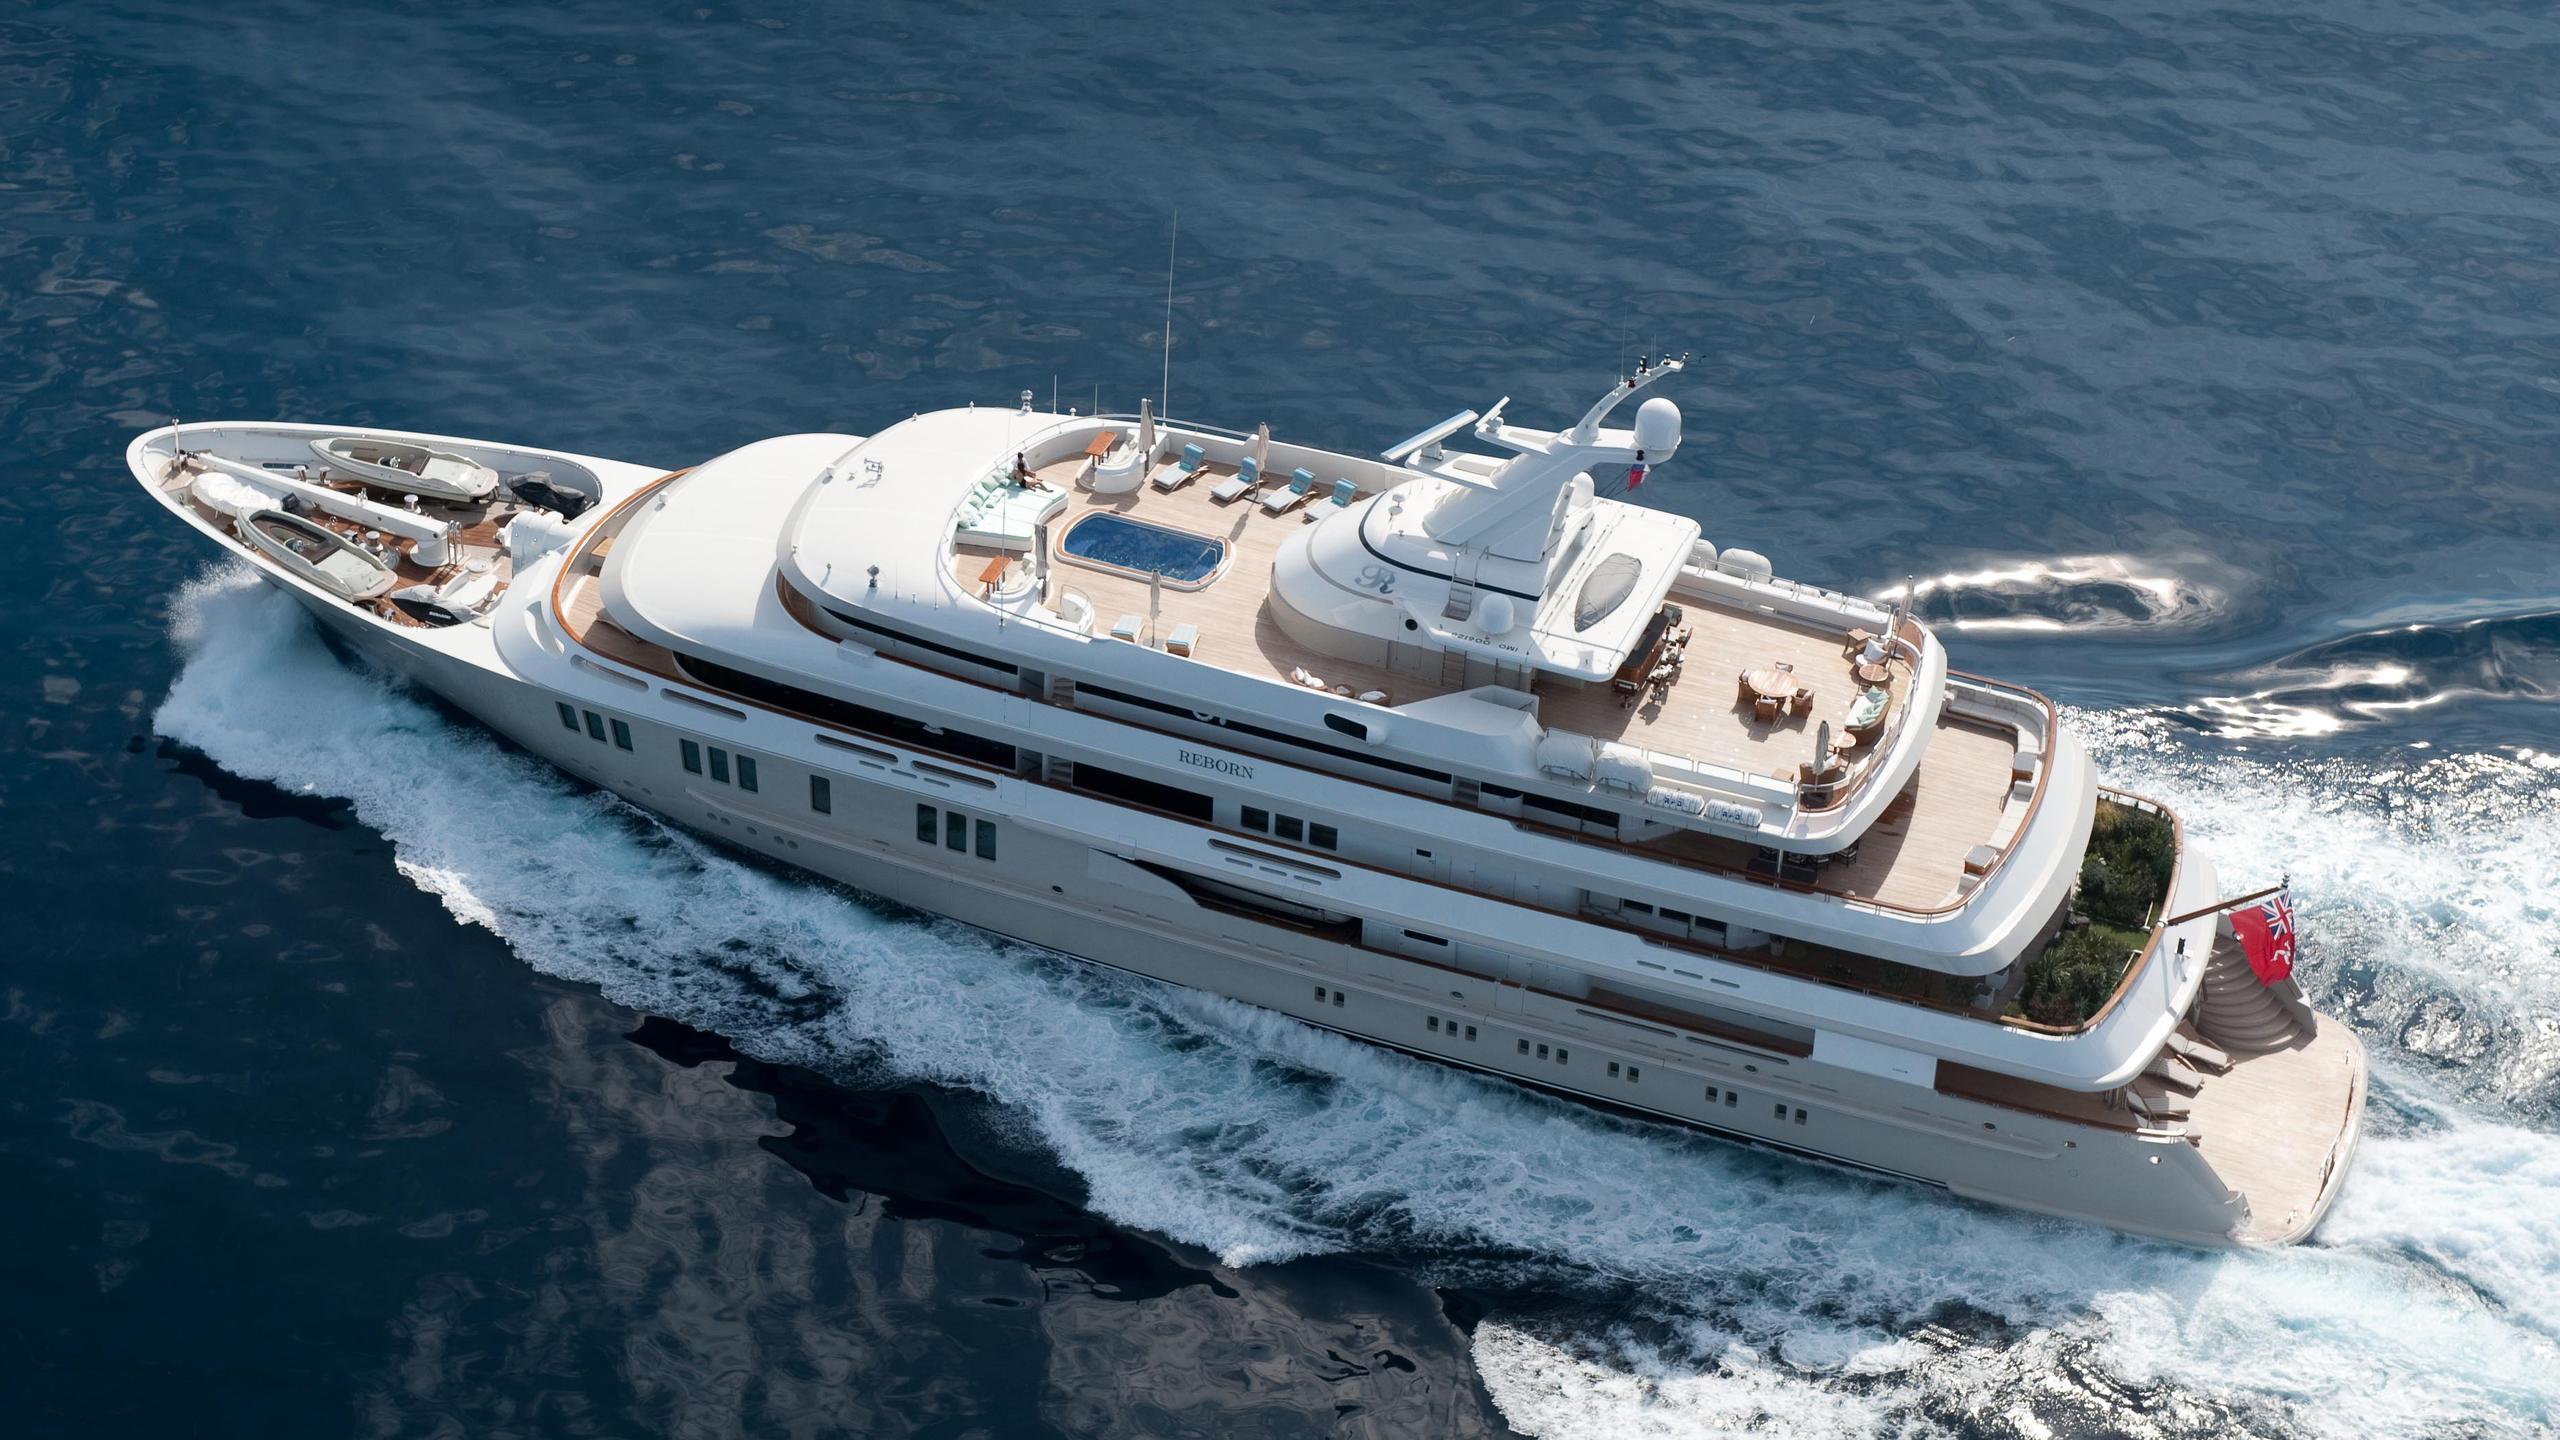 reborn-motor-yacht-amels-1999-75m-aerial